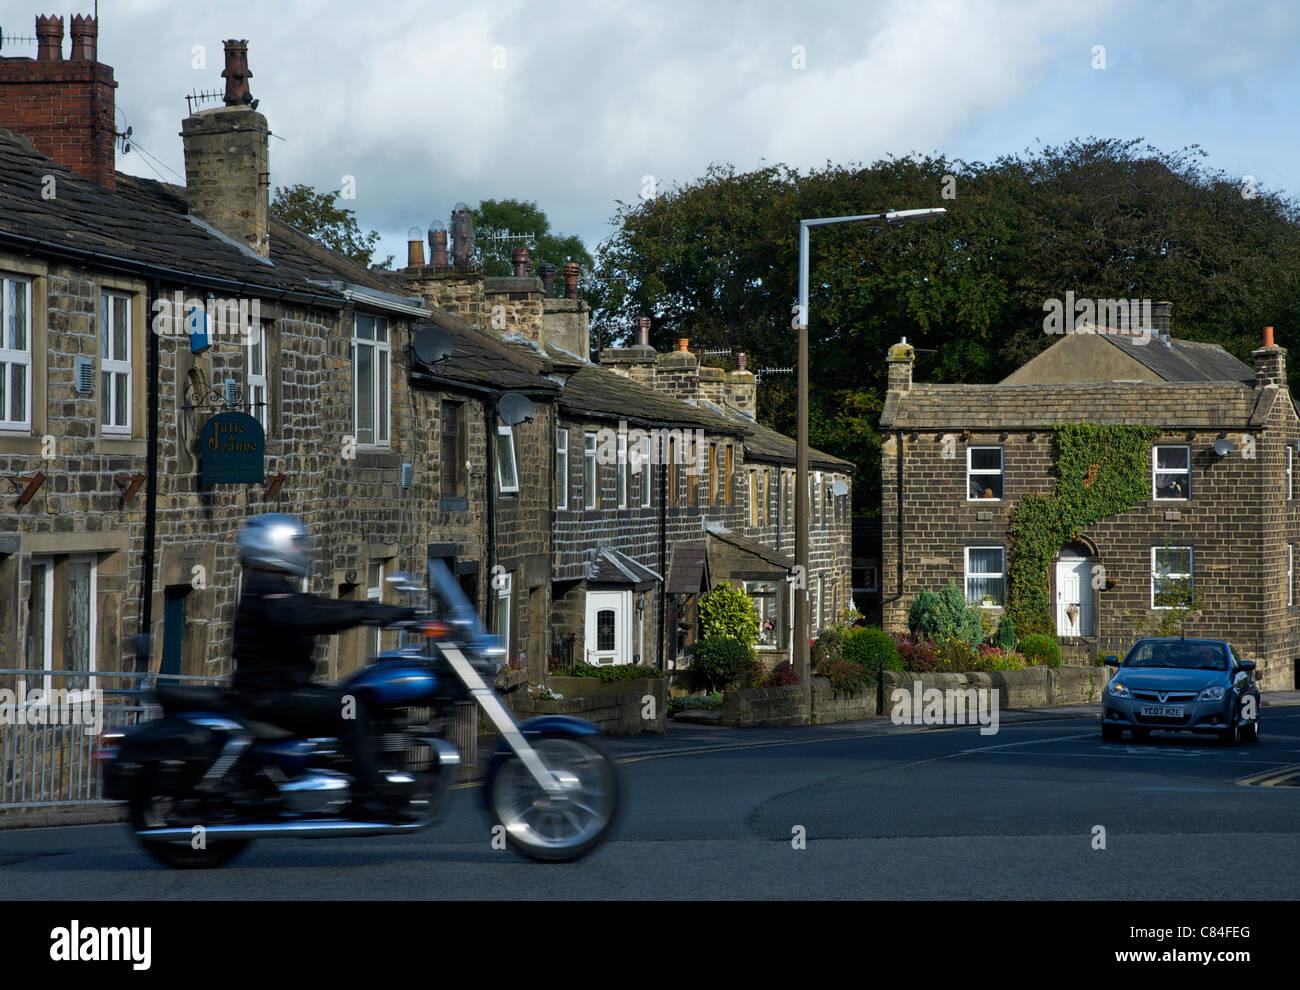 Biker passing through the village of Steeton, West Yorkshire, England UK - Stock Image